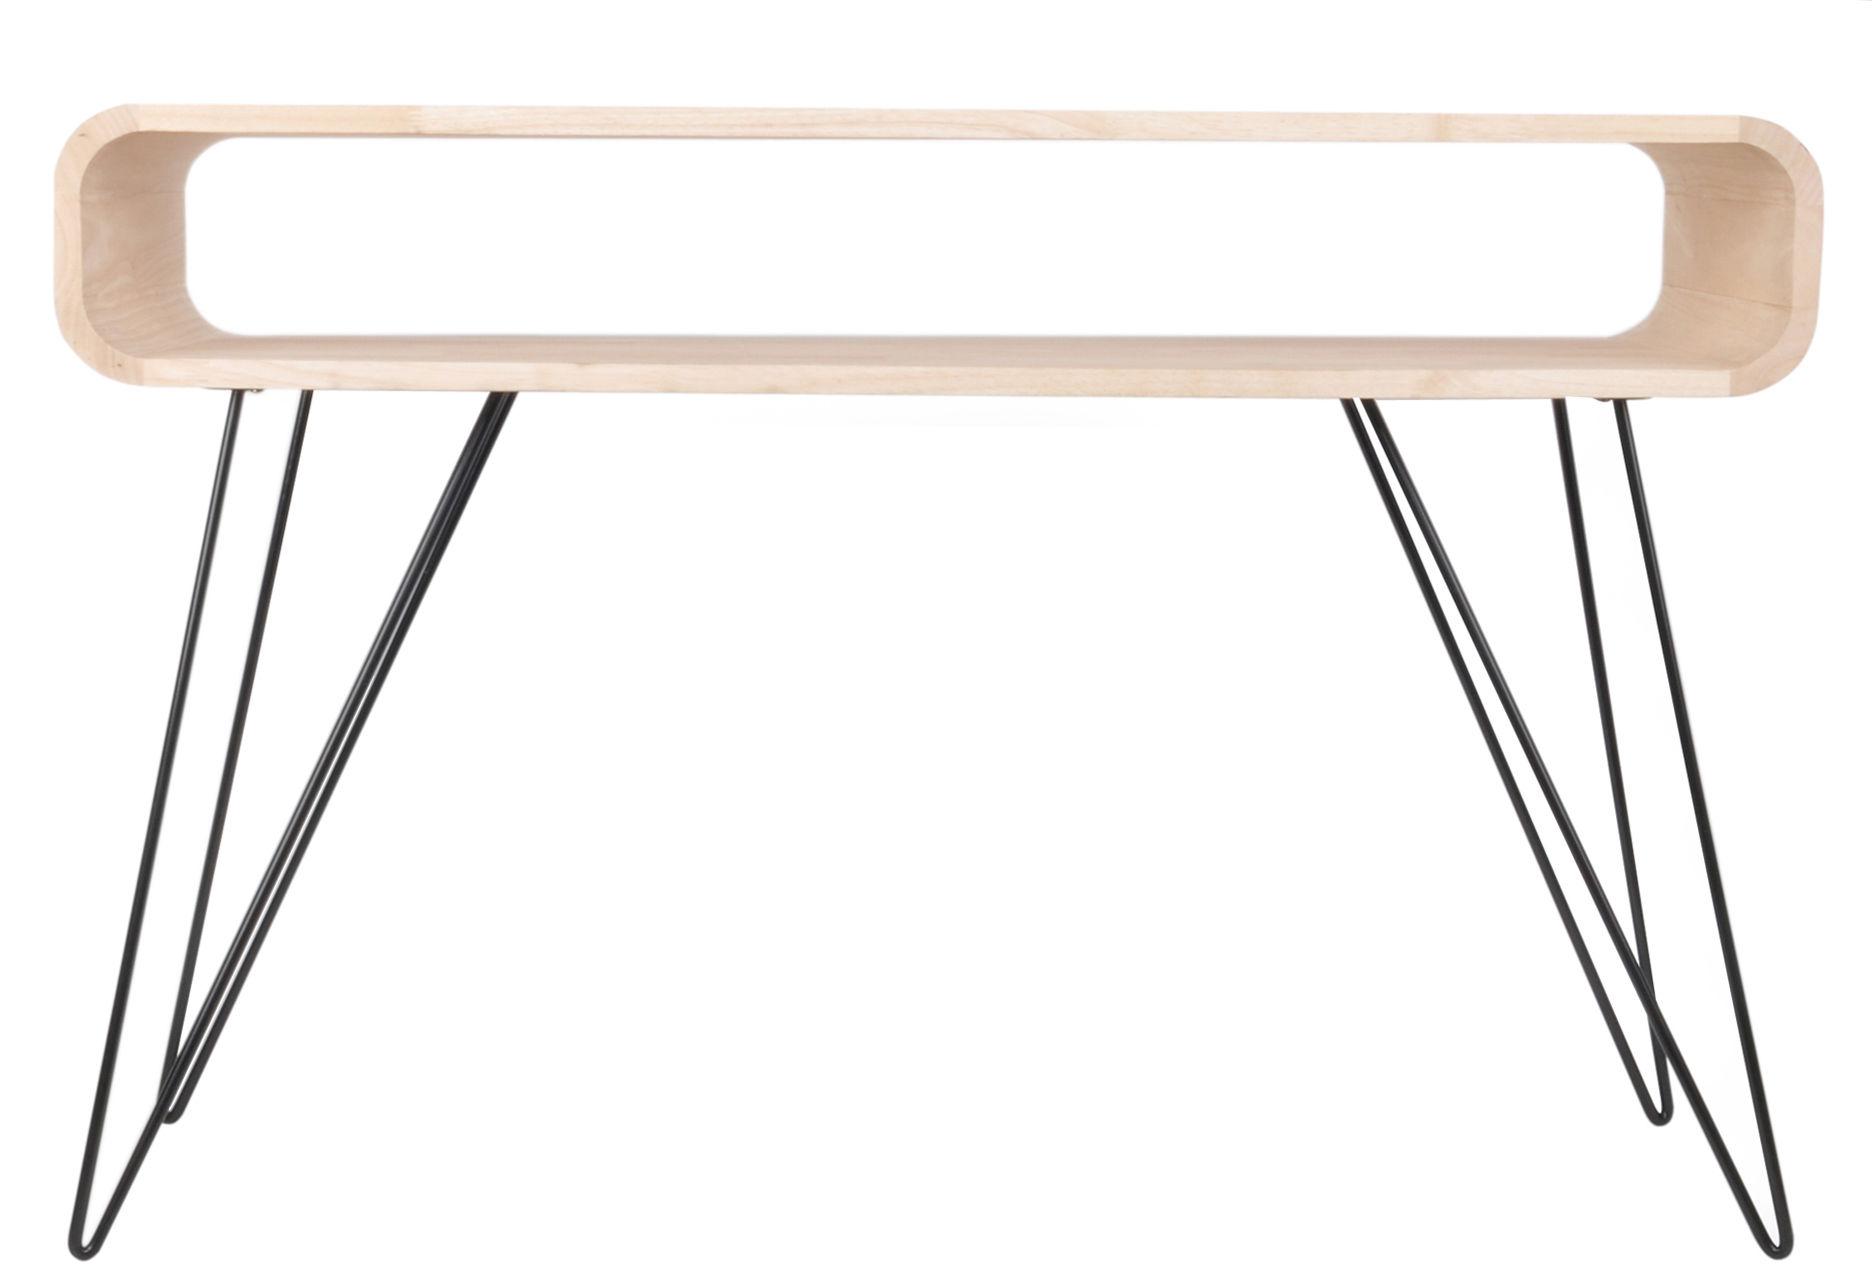 console metro sofa bureau l 120 x h 80 cm bois naturel. Black Bedroom Furniture Sets. Home Design Ideas